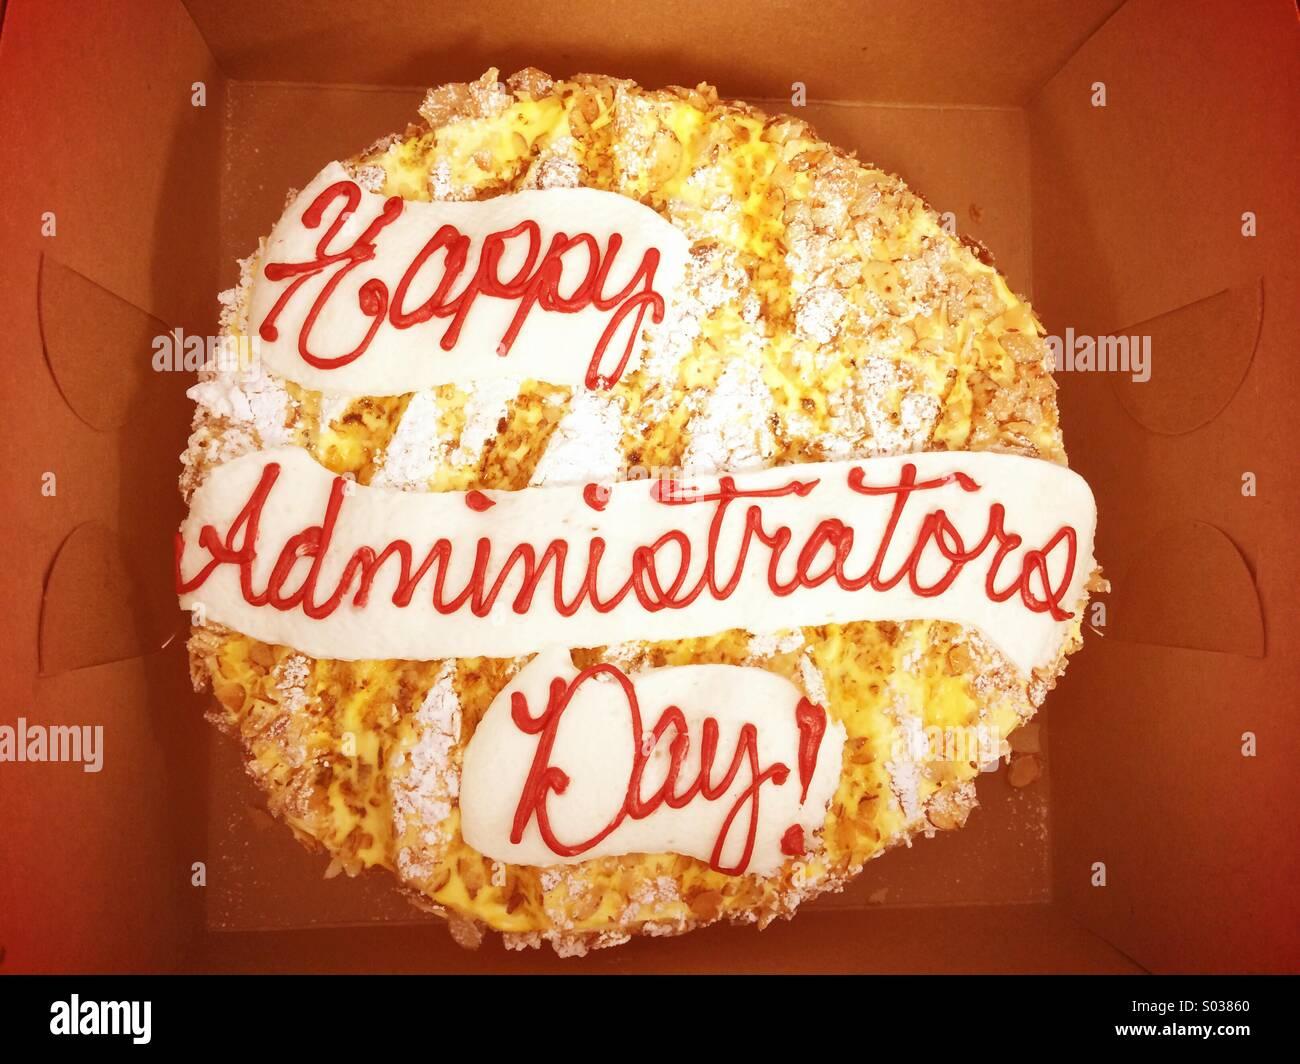 Happy Secretary's Day Cake - Stock Image